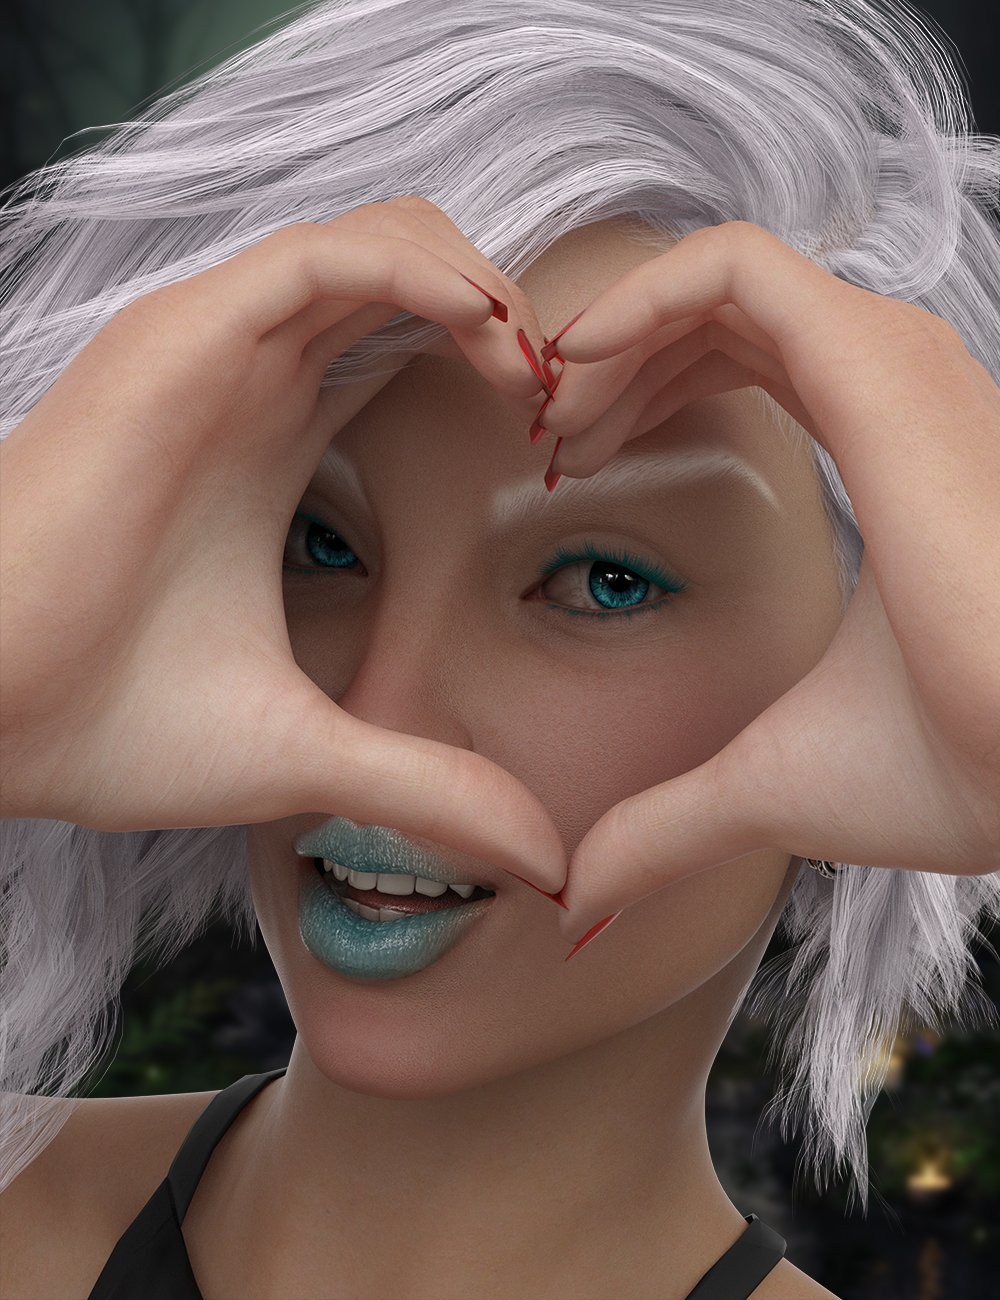 Aella for Genesis 8 Female by: hotlilme74, 3D Models by Daz 3D